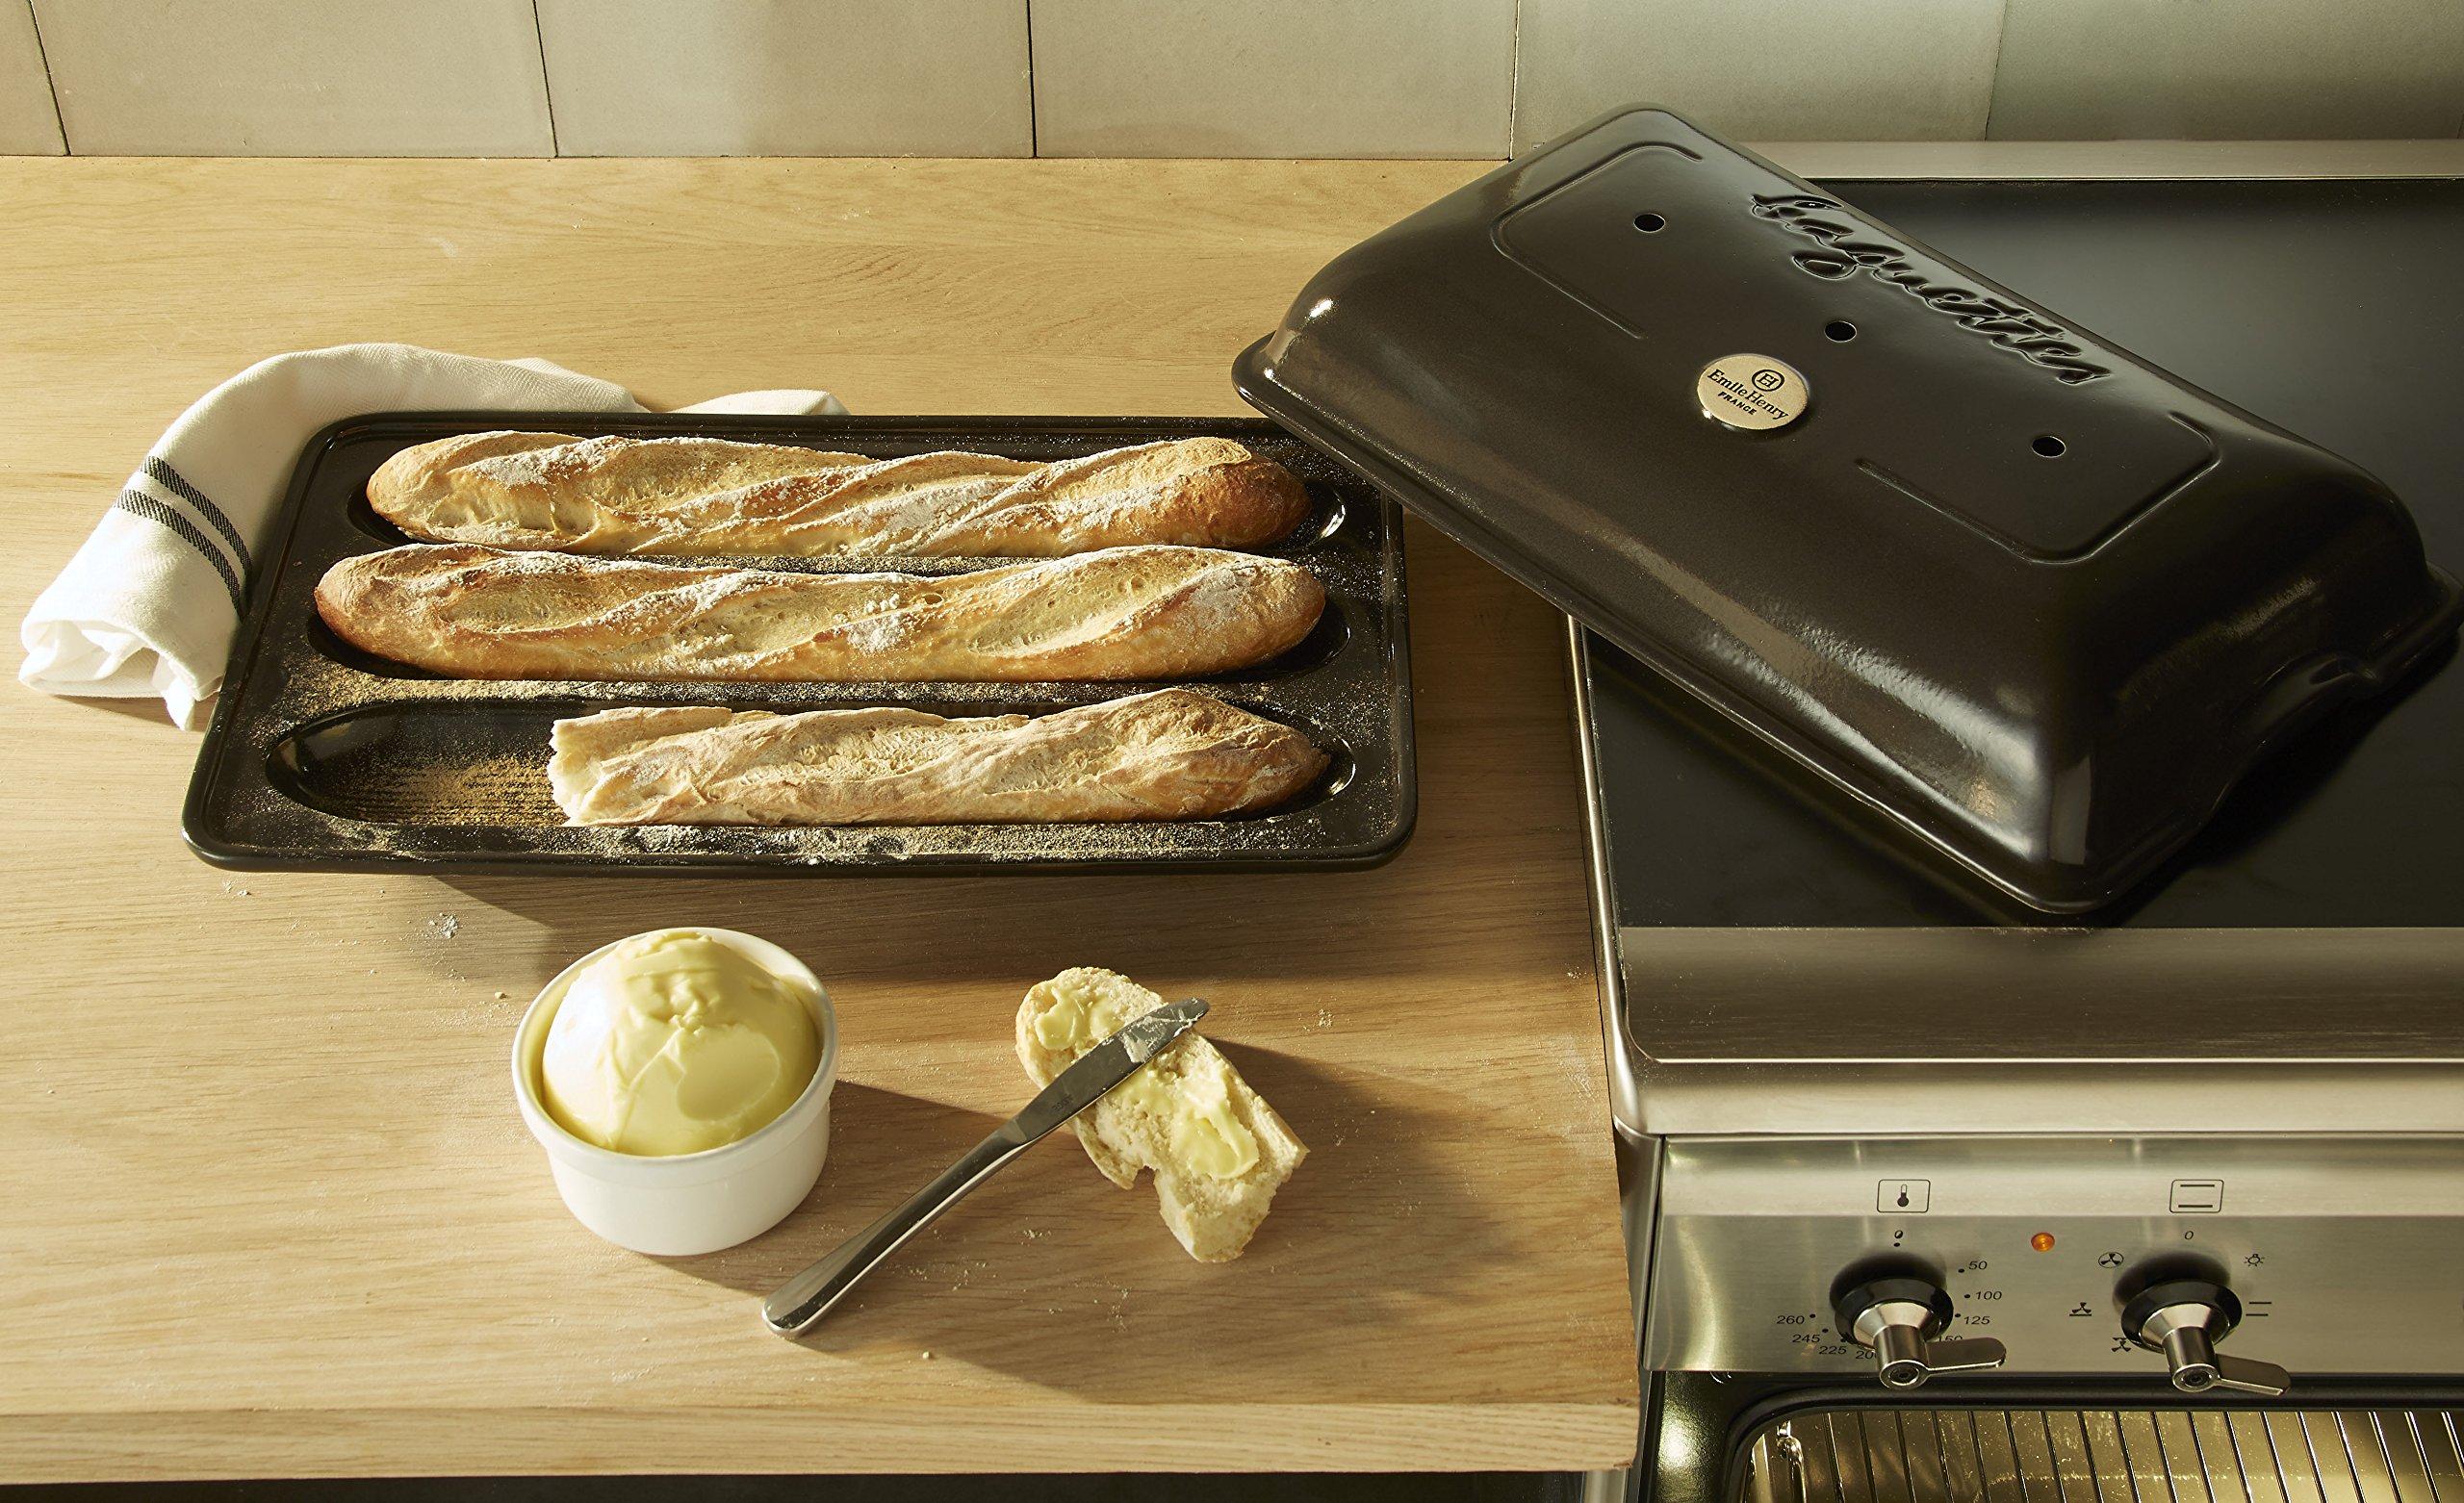 3-Piece Set: Emile Henry Ceramic Baguette Baker Charcoal, Mure & Peyrot Longuet Bread Scoring Lame, Matfer Baker's Couche Proofing Cloth Linen, 23.5 x 35.5 - Bundle by Mixed (Image #6)